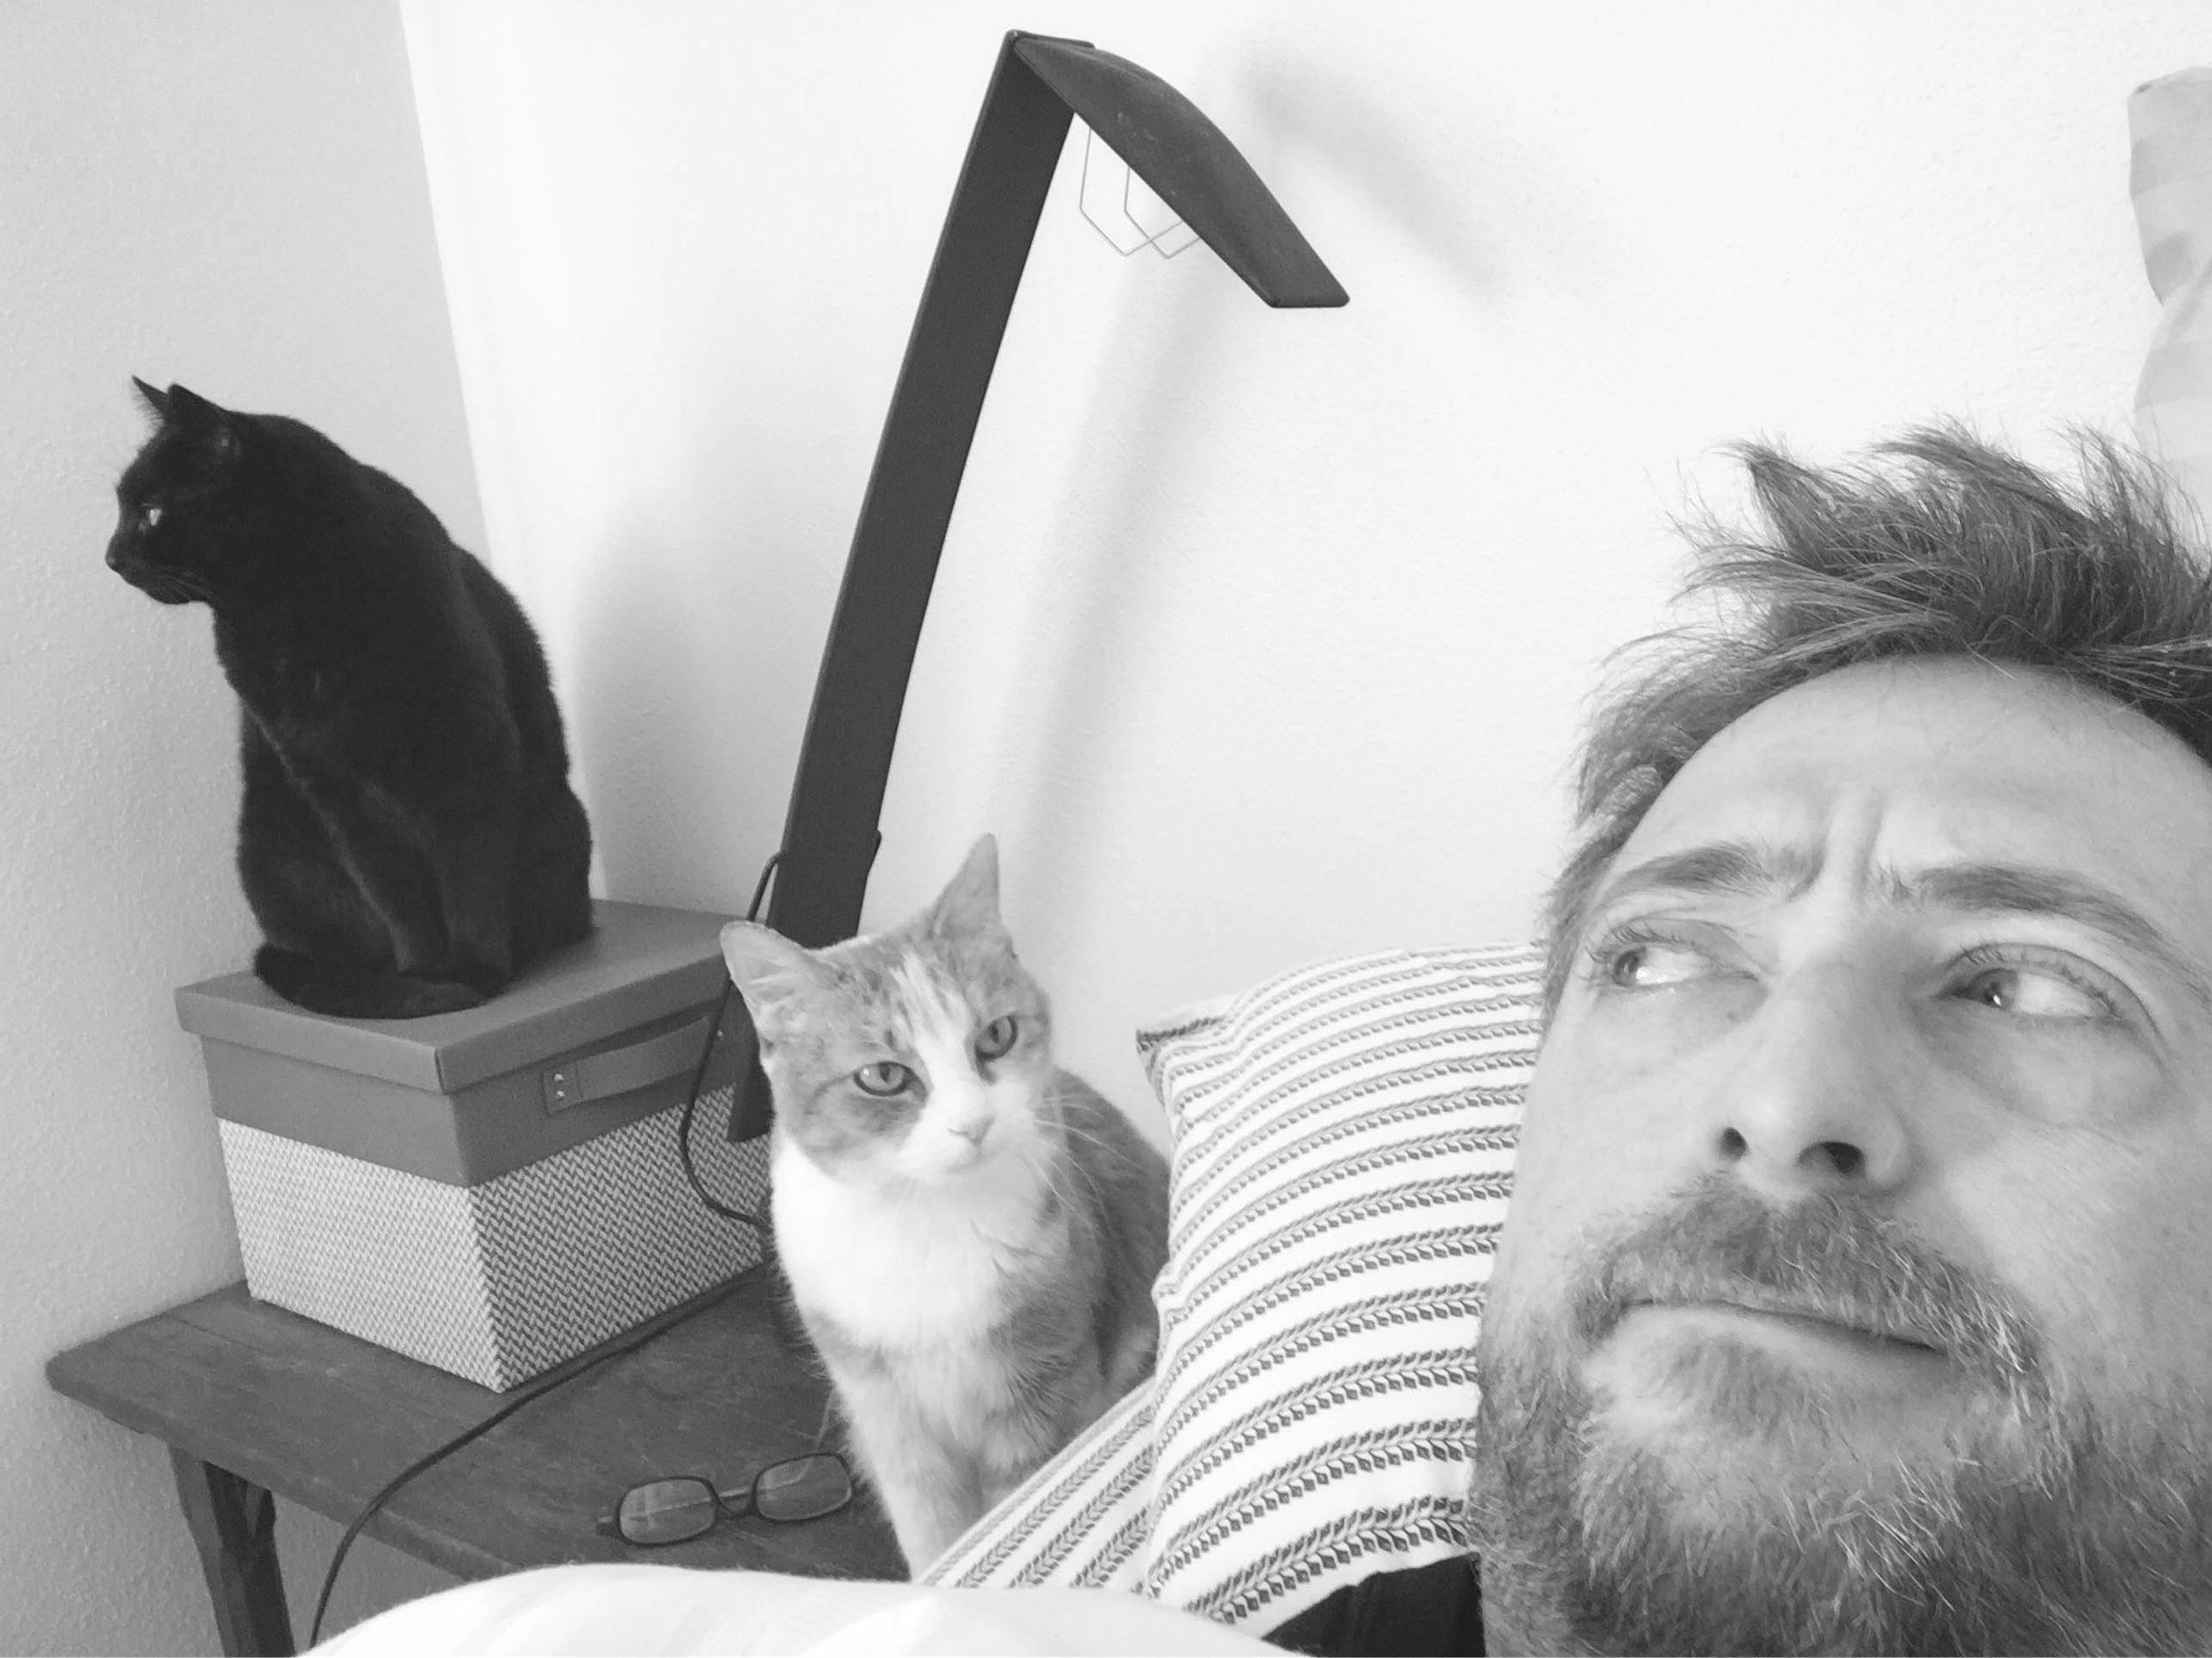 Alarm clocks (Shiloh and Fiona)